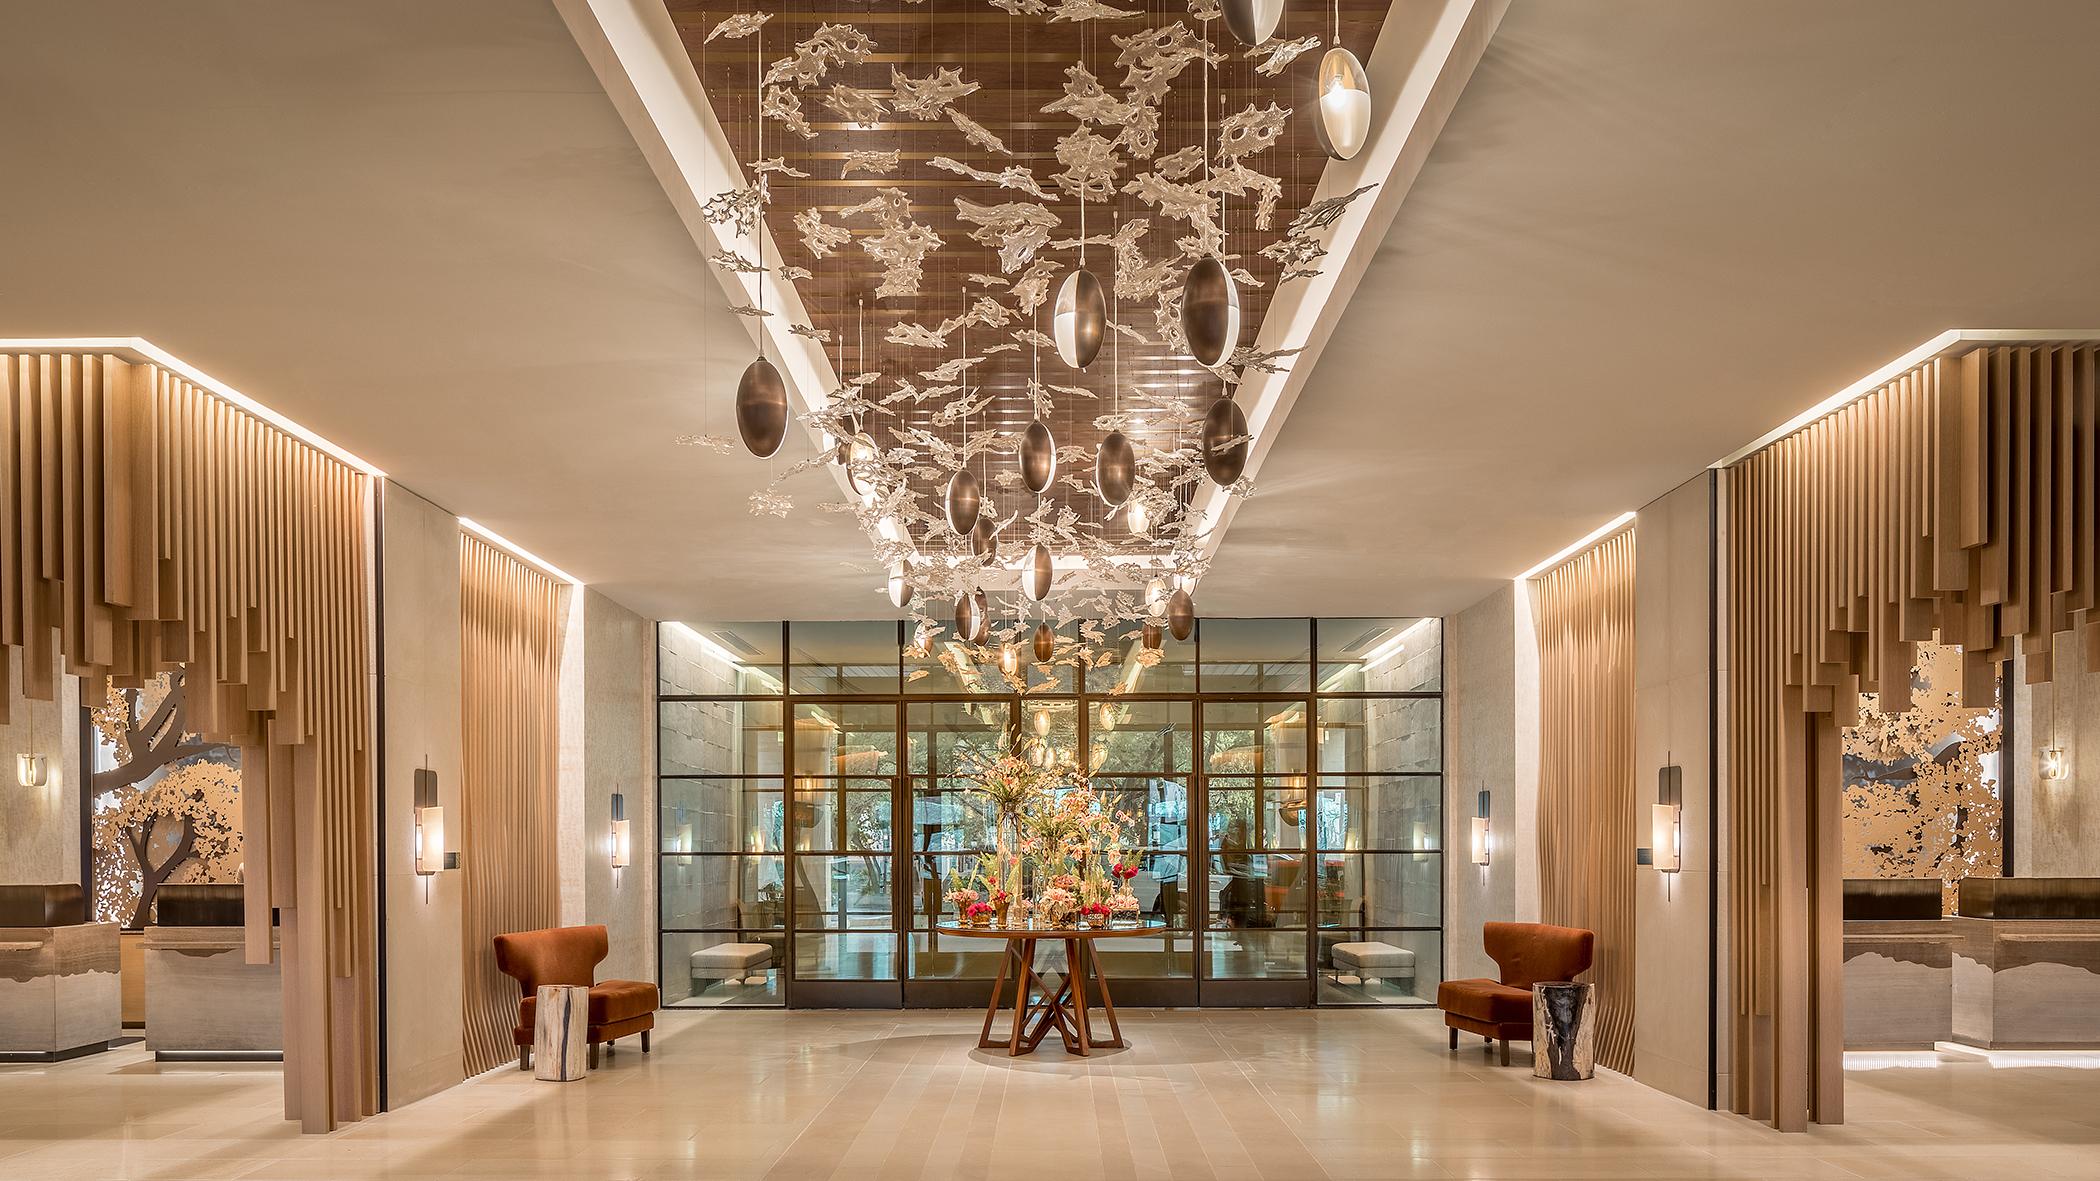 Four Seasons Hotel Austin Modernization